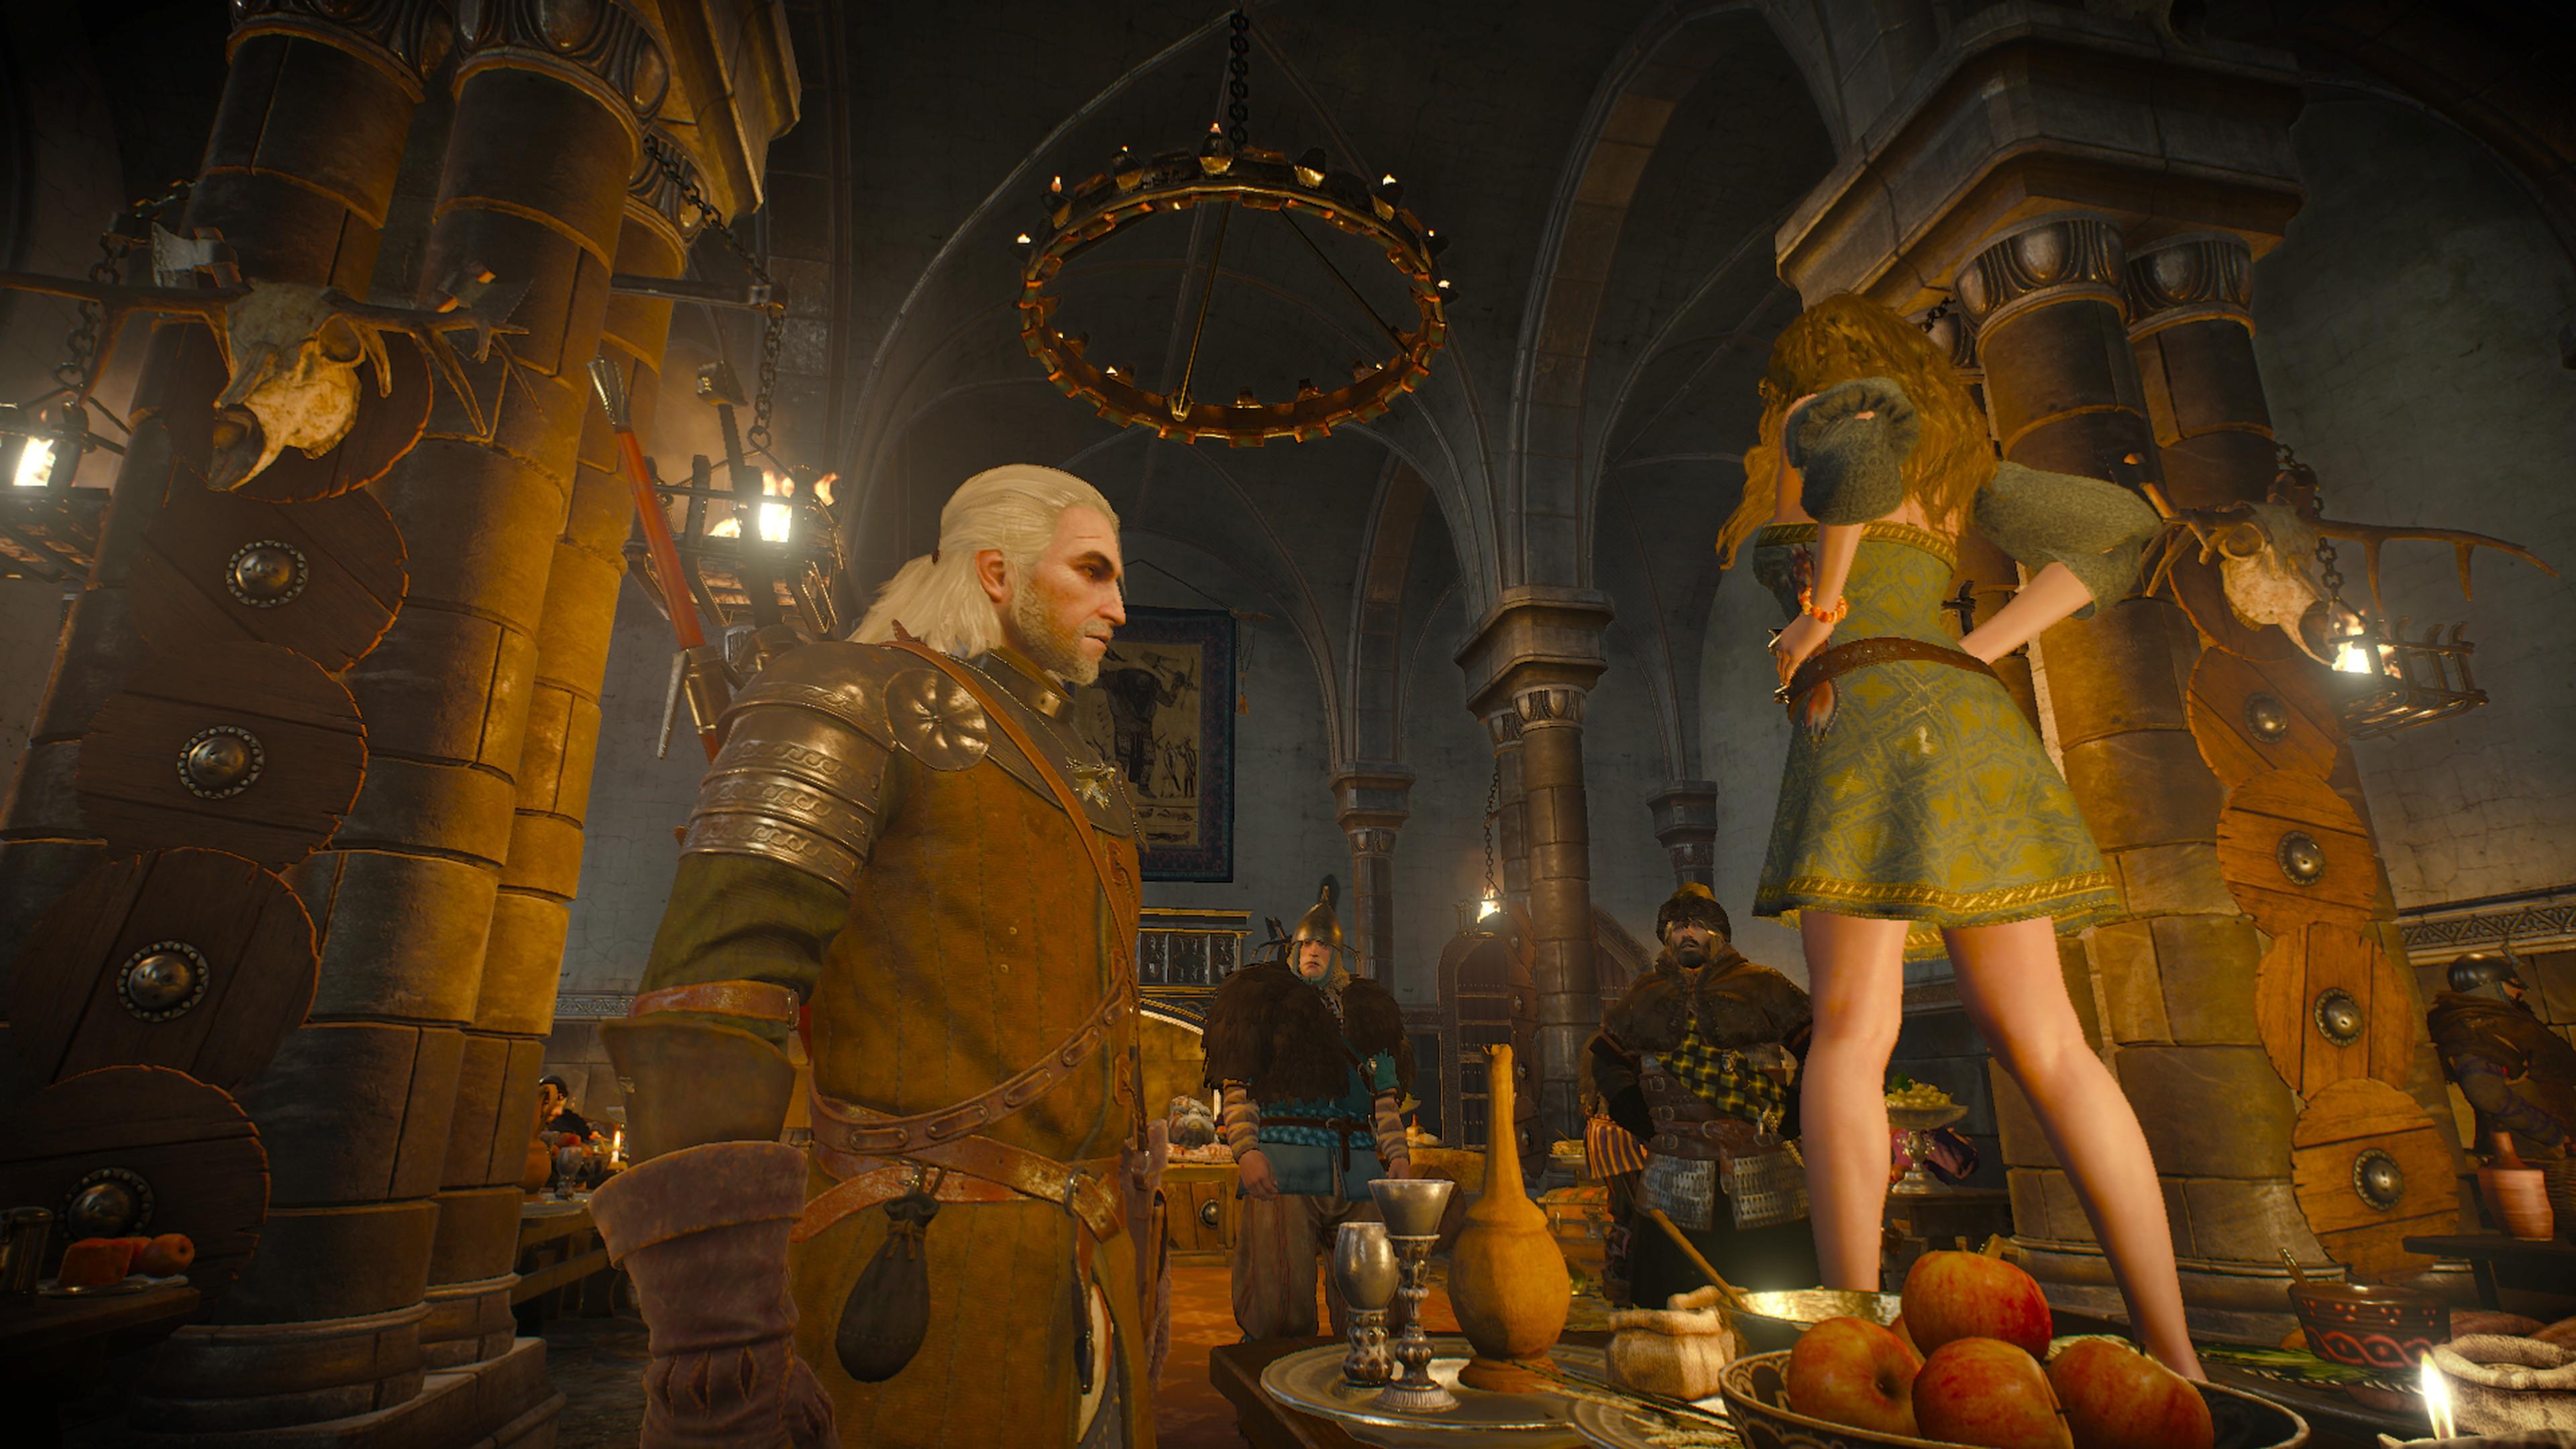 Крепость Каэр Трольде_16.jpg - Witcher 3: Wild Hunt, the